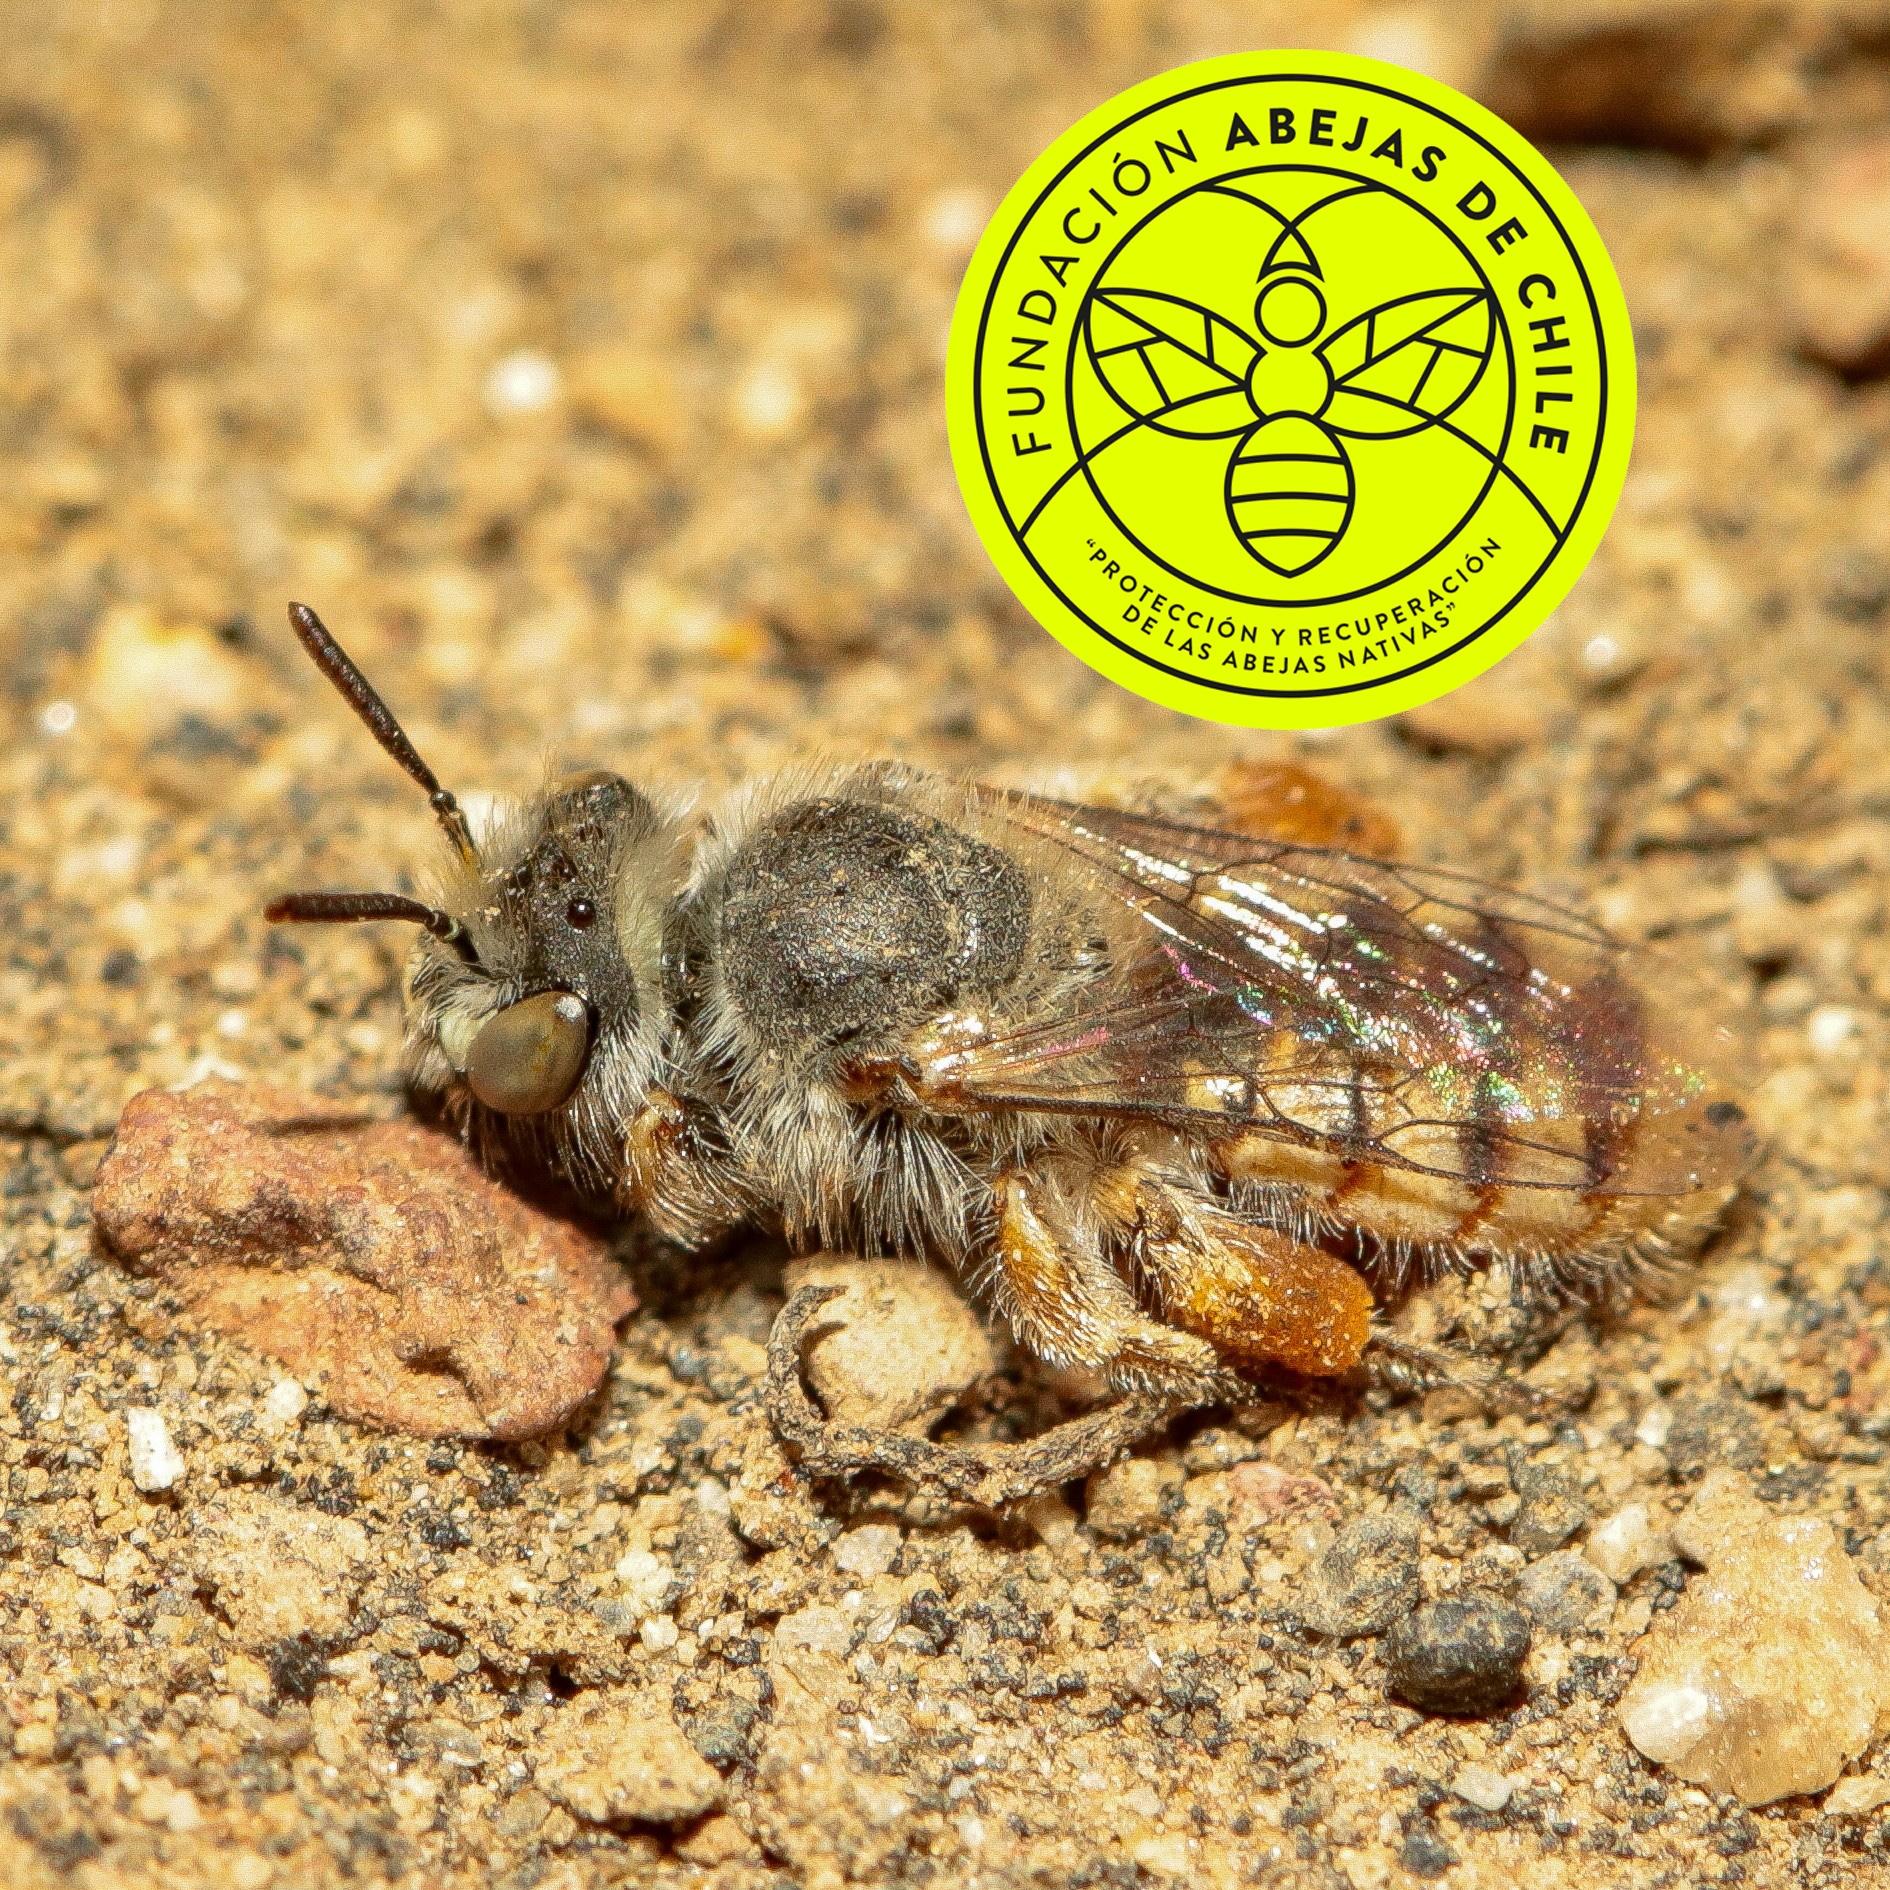 Calliopsis-rigormortis-Pablo-Vial-Valdés-Abejas-abeja-nativa-endémica-chile-wild-bee-de-experto-especialista-investigador-suelos-nidos-1